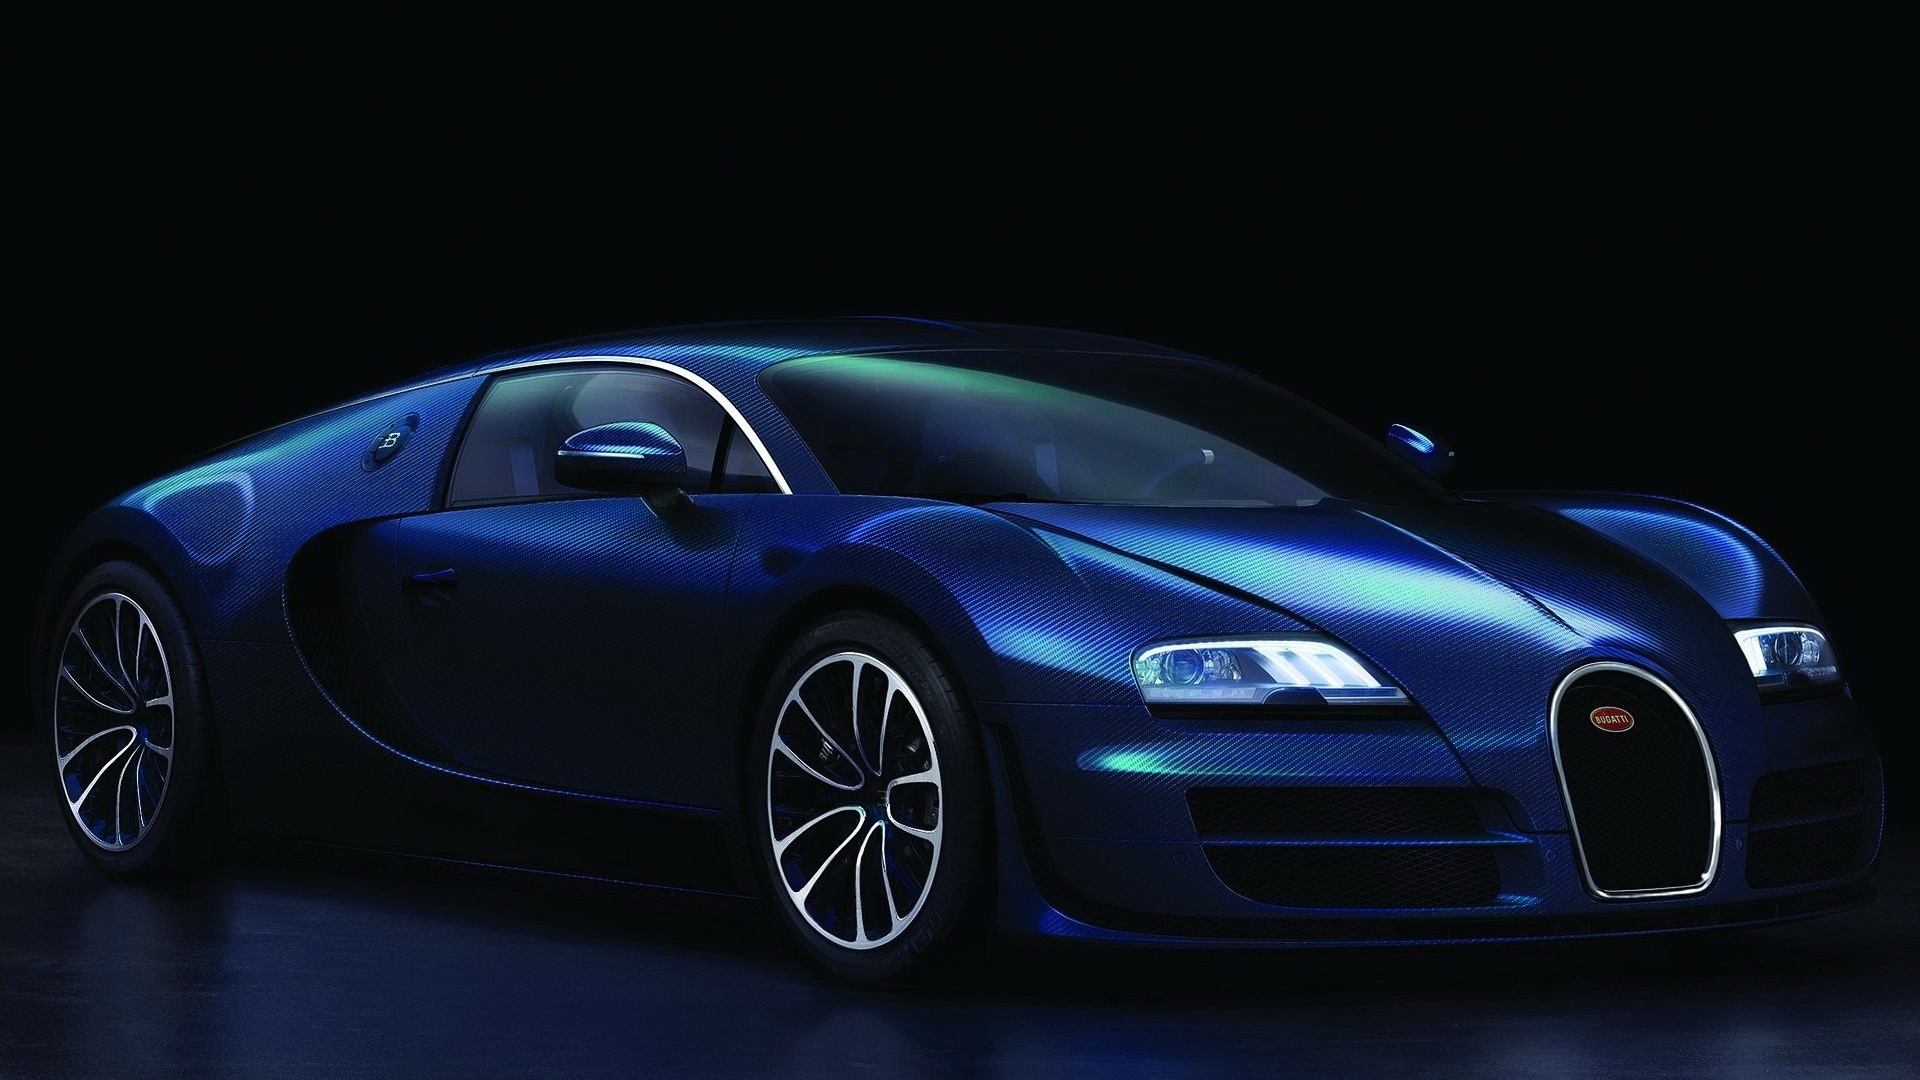 bugatti veyron wallpaper super sport car desktop wallpapers - Bugatti Veyron Wallpaper